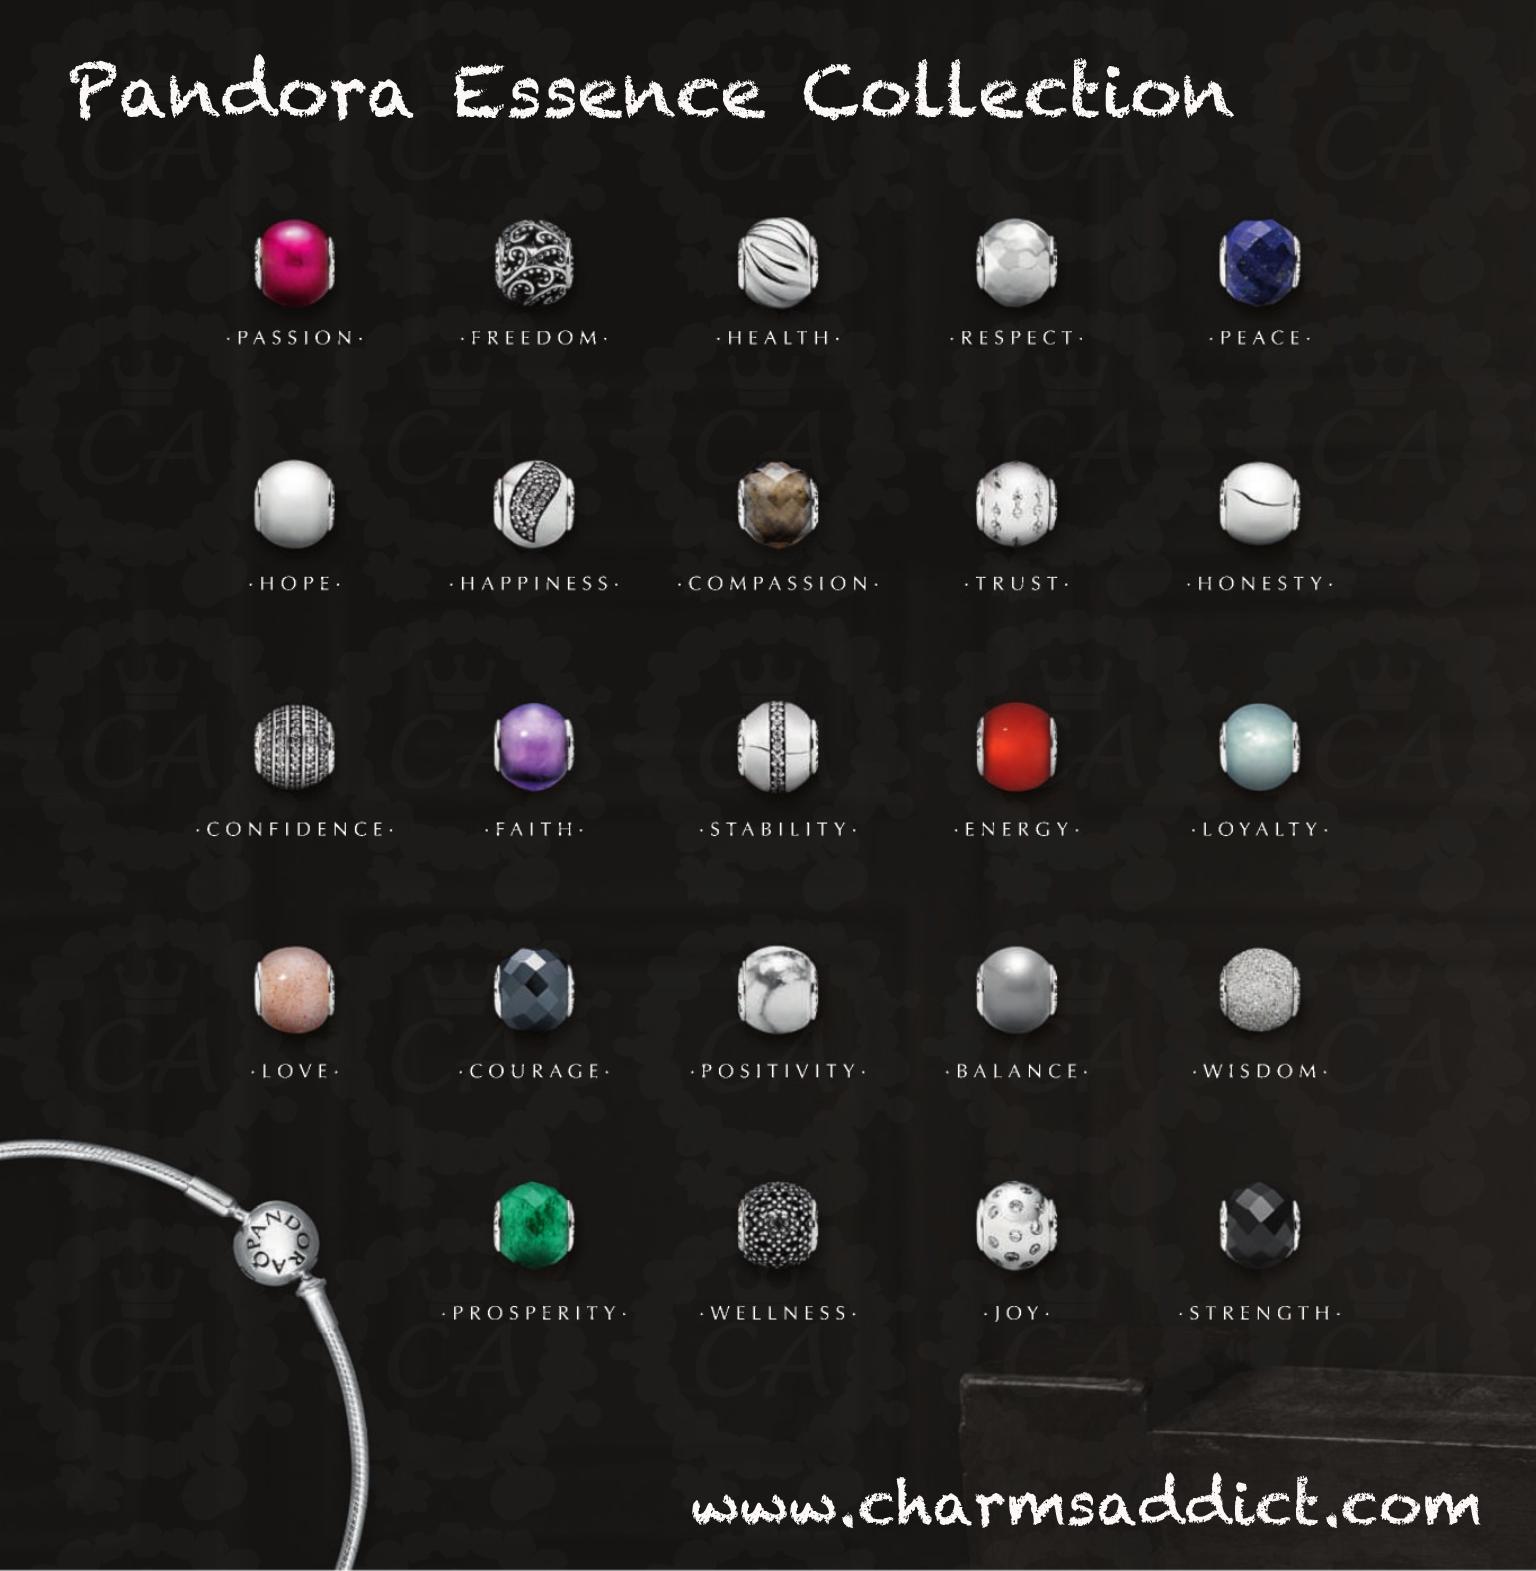 Switzerland Pandora Bracelet Charms Meanings 27d47 40640